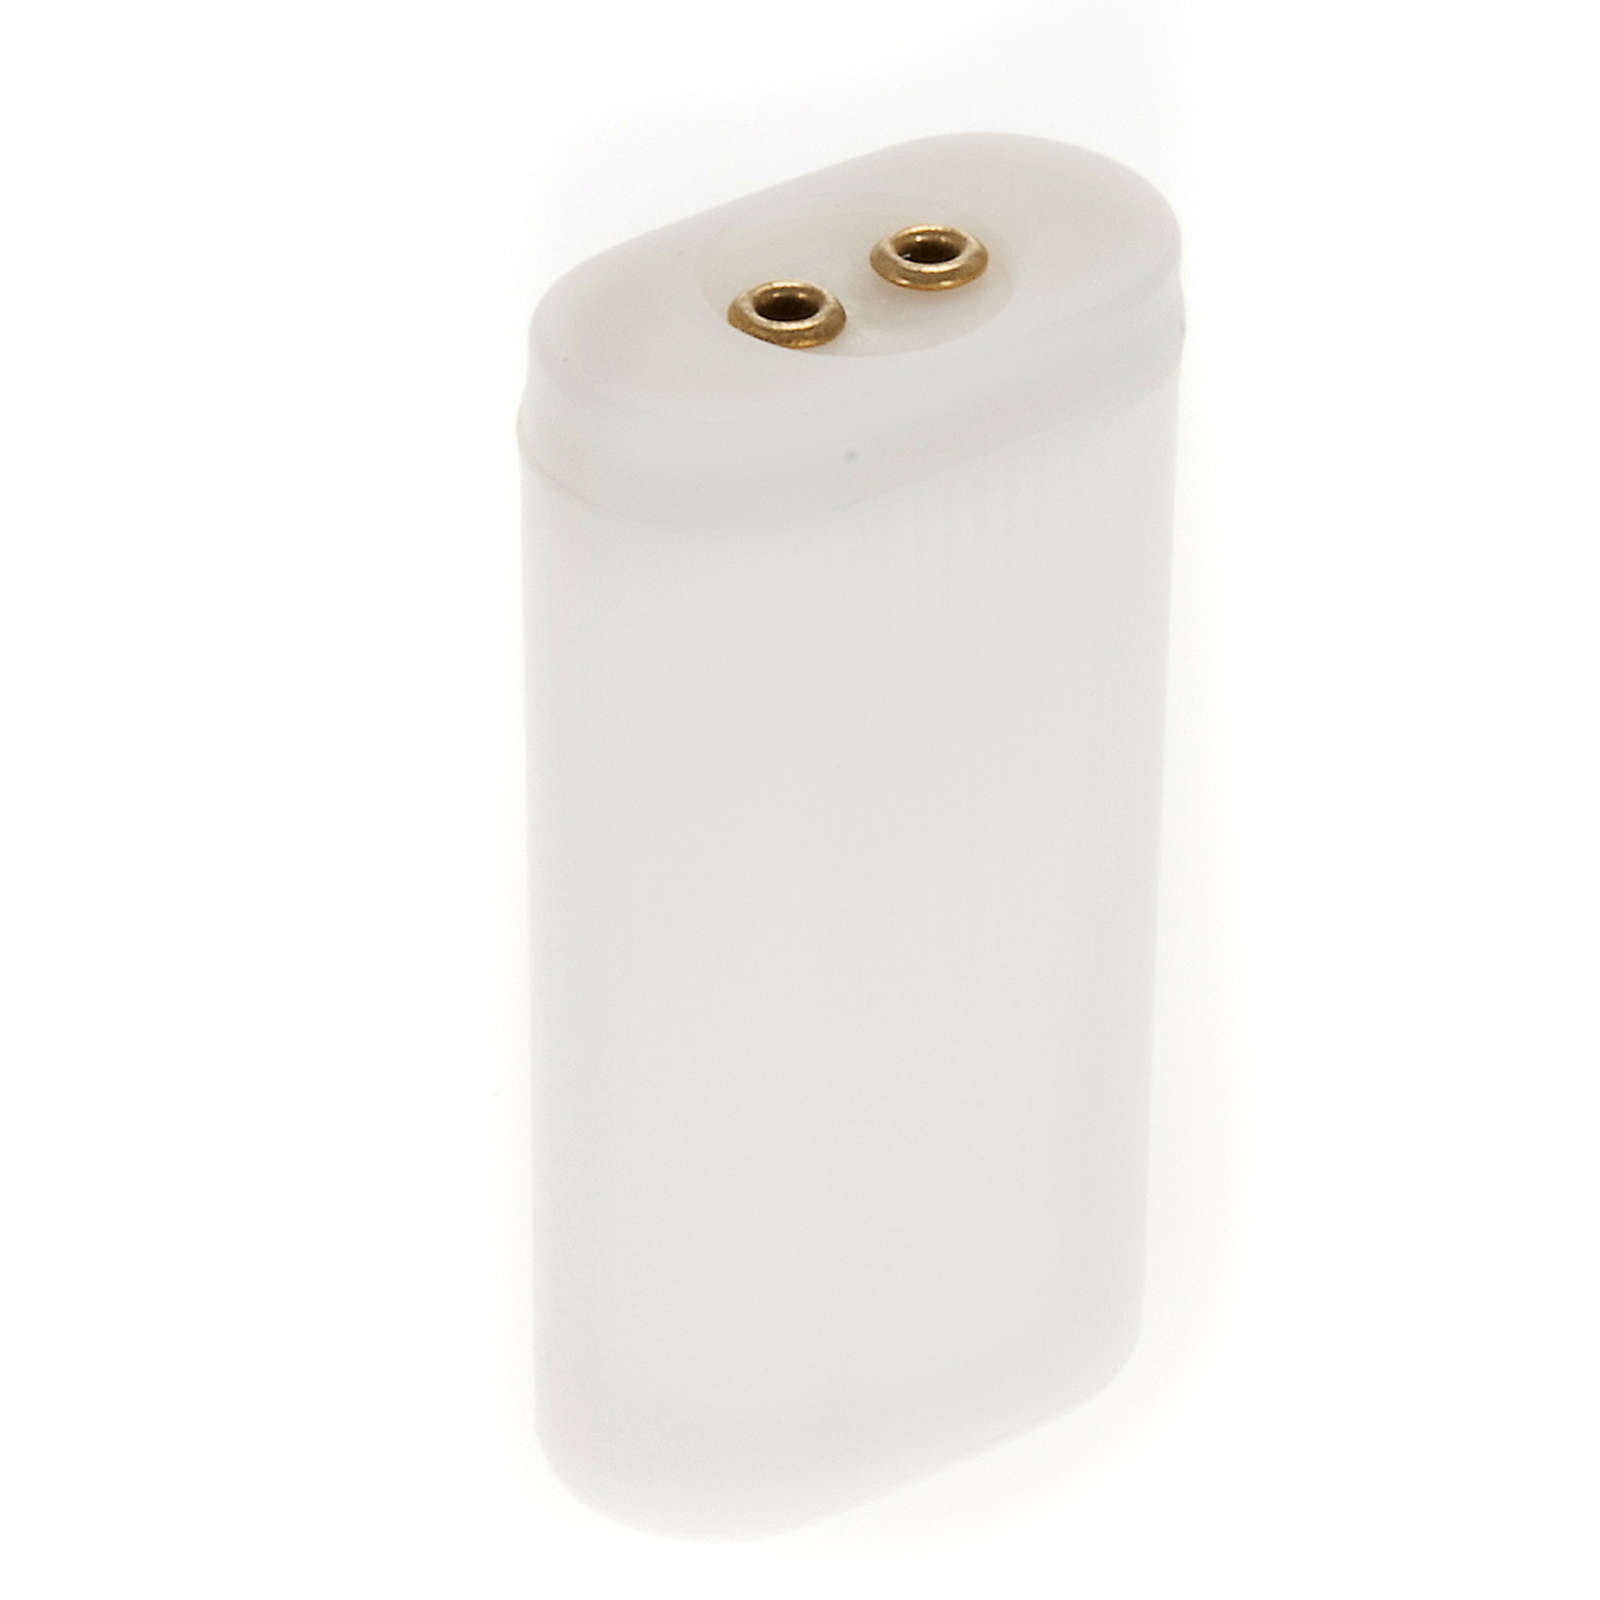 Portabatterie stilo per luci presepe 4